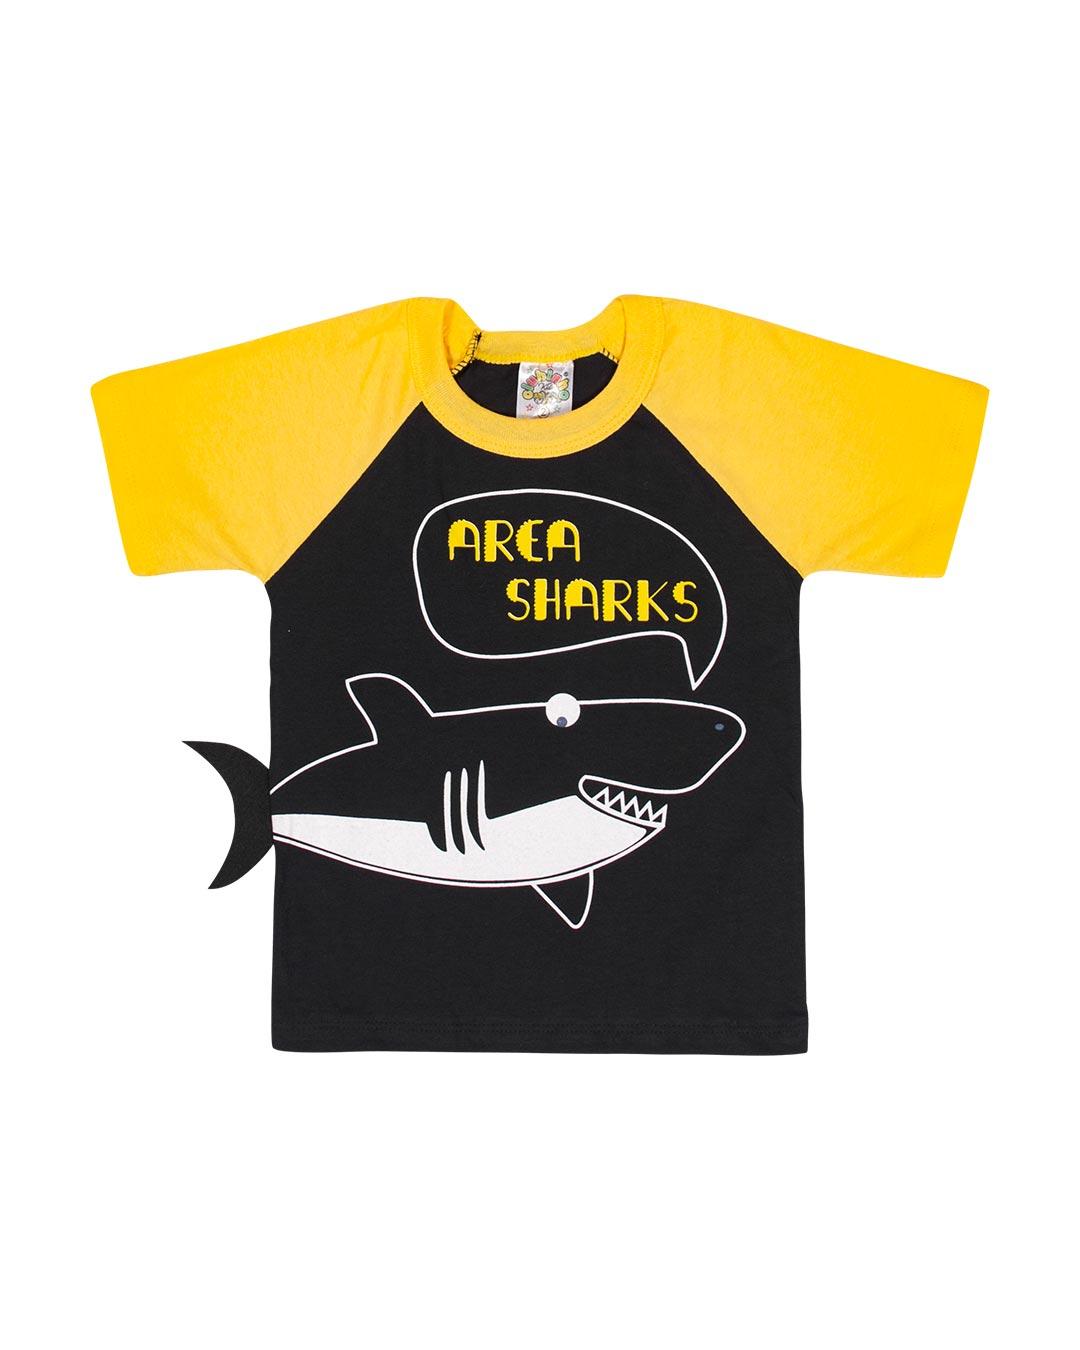 Camiseta Infantil Área Sharks - Clubinho